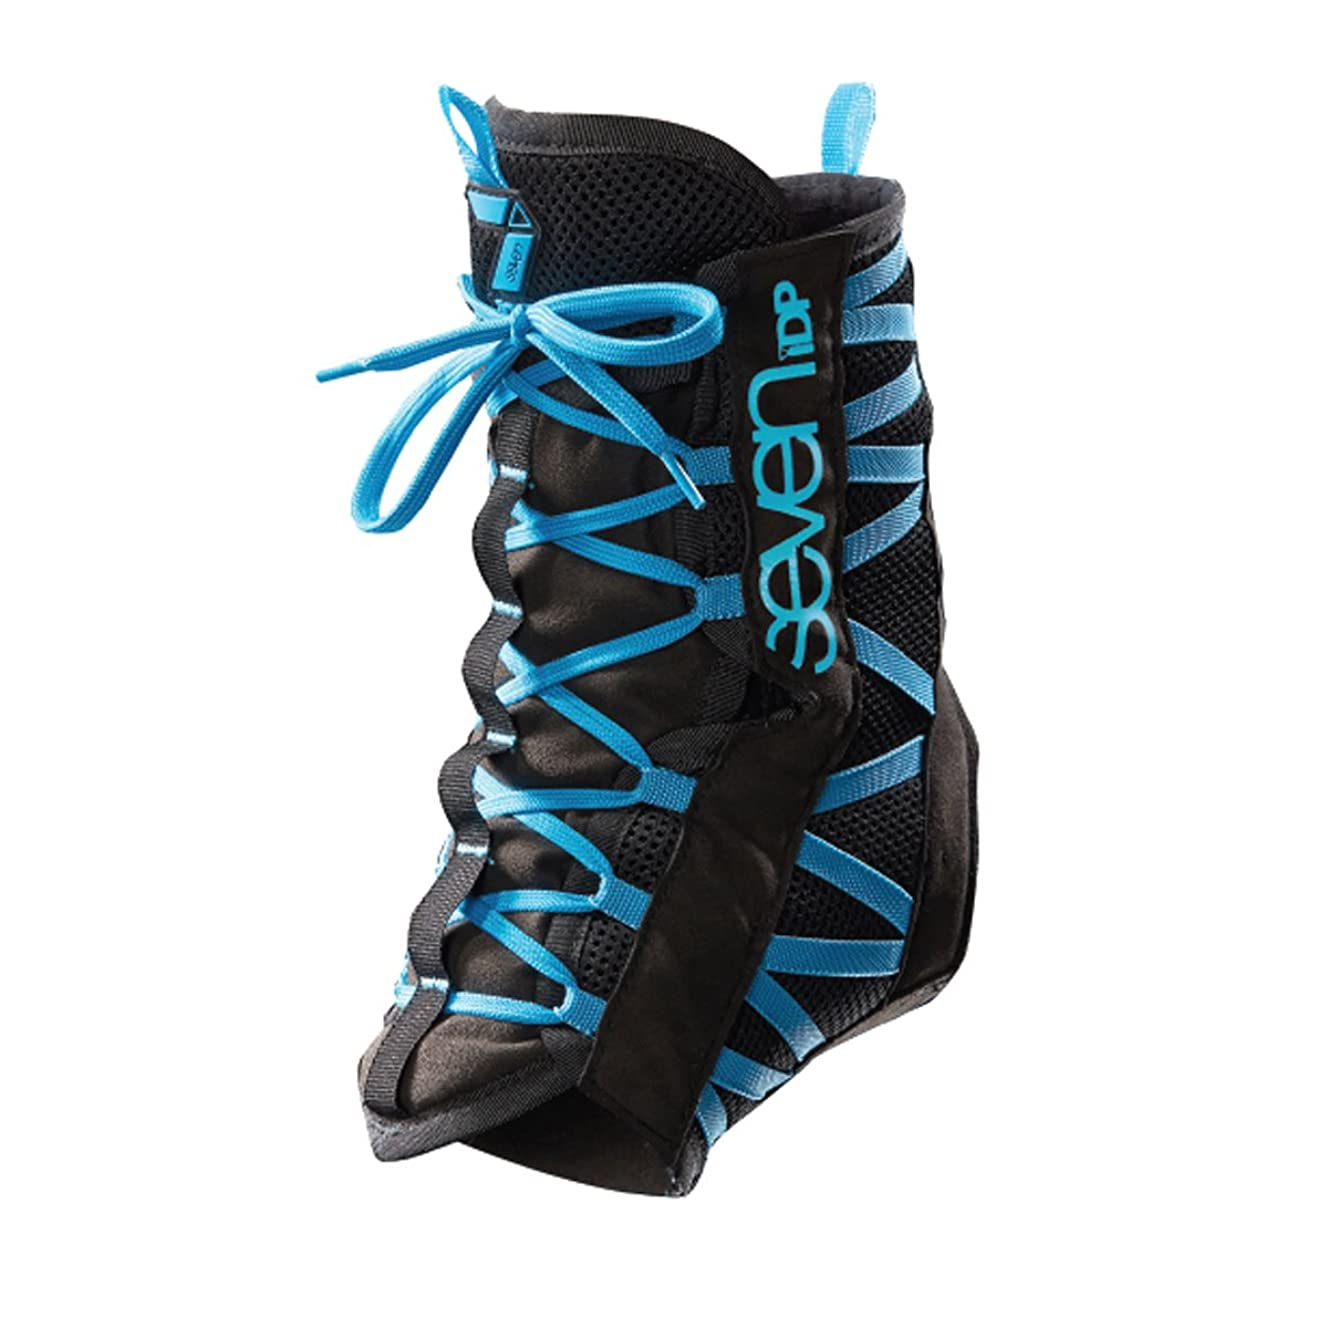 7iDP Control Ankle Brace Protective Gear